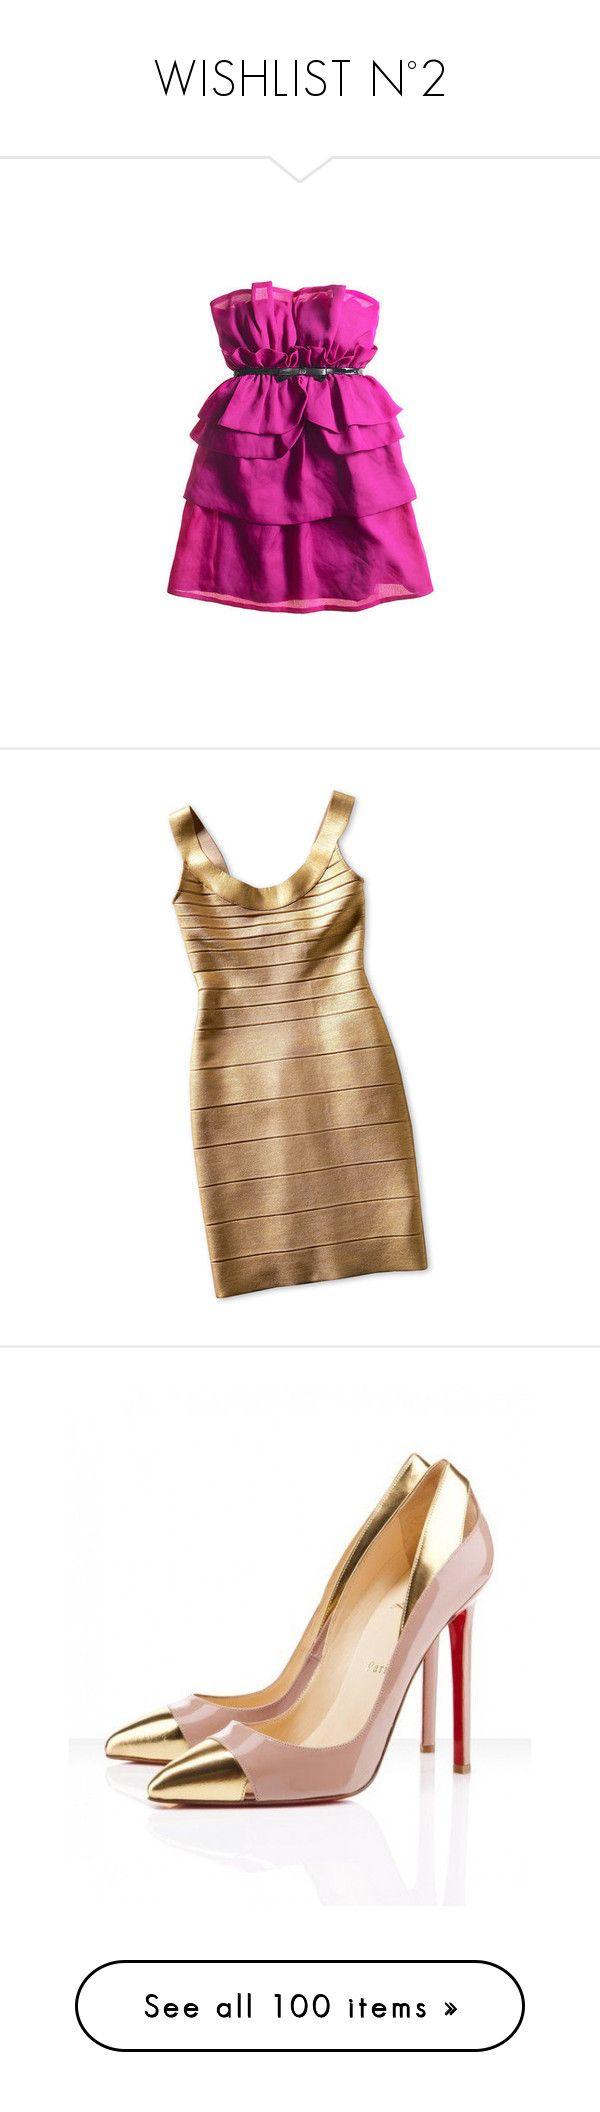 """WISHLIST N°2"" by vict0ria ❤ liked on Polyvore featuring WishList, DreamCloset, dresses, vestidos, vestiti, short dress, women, scoop-neck dresses, short gold dresses and gold bandage dress"